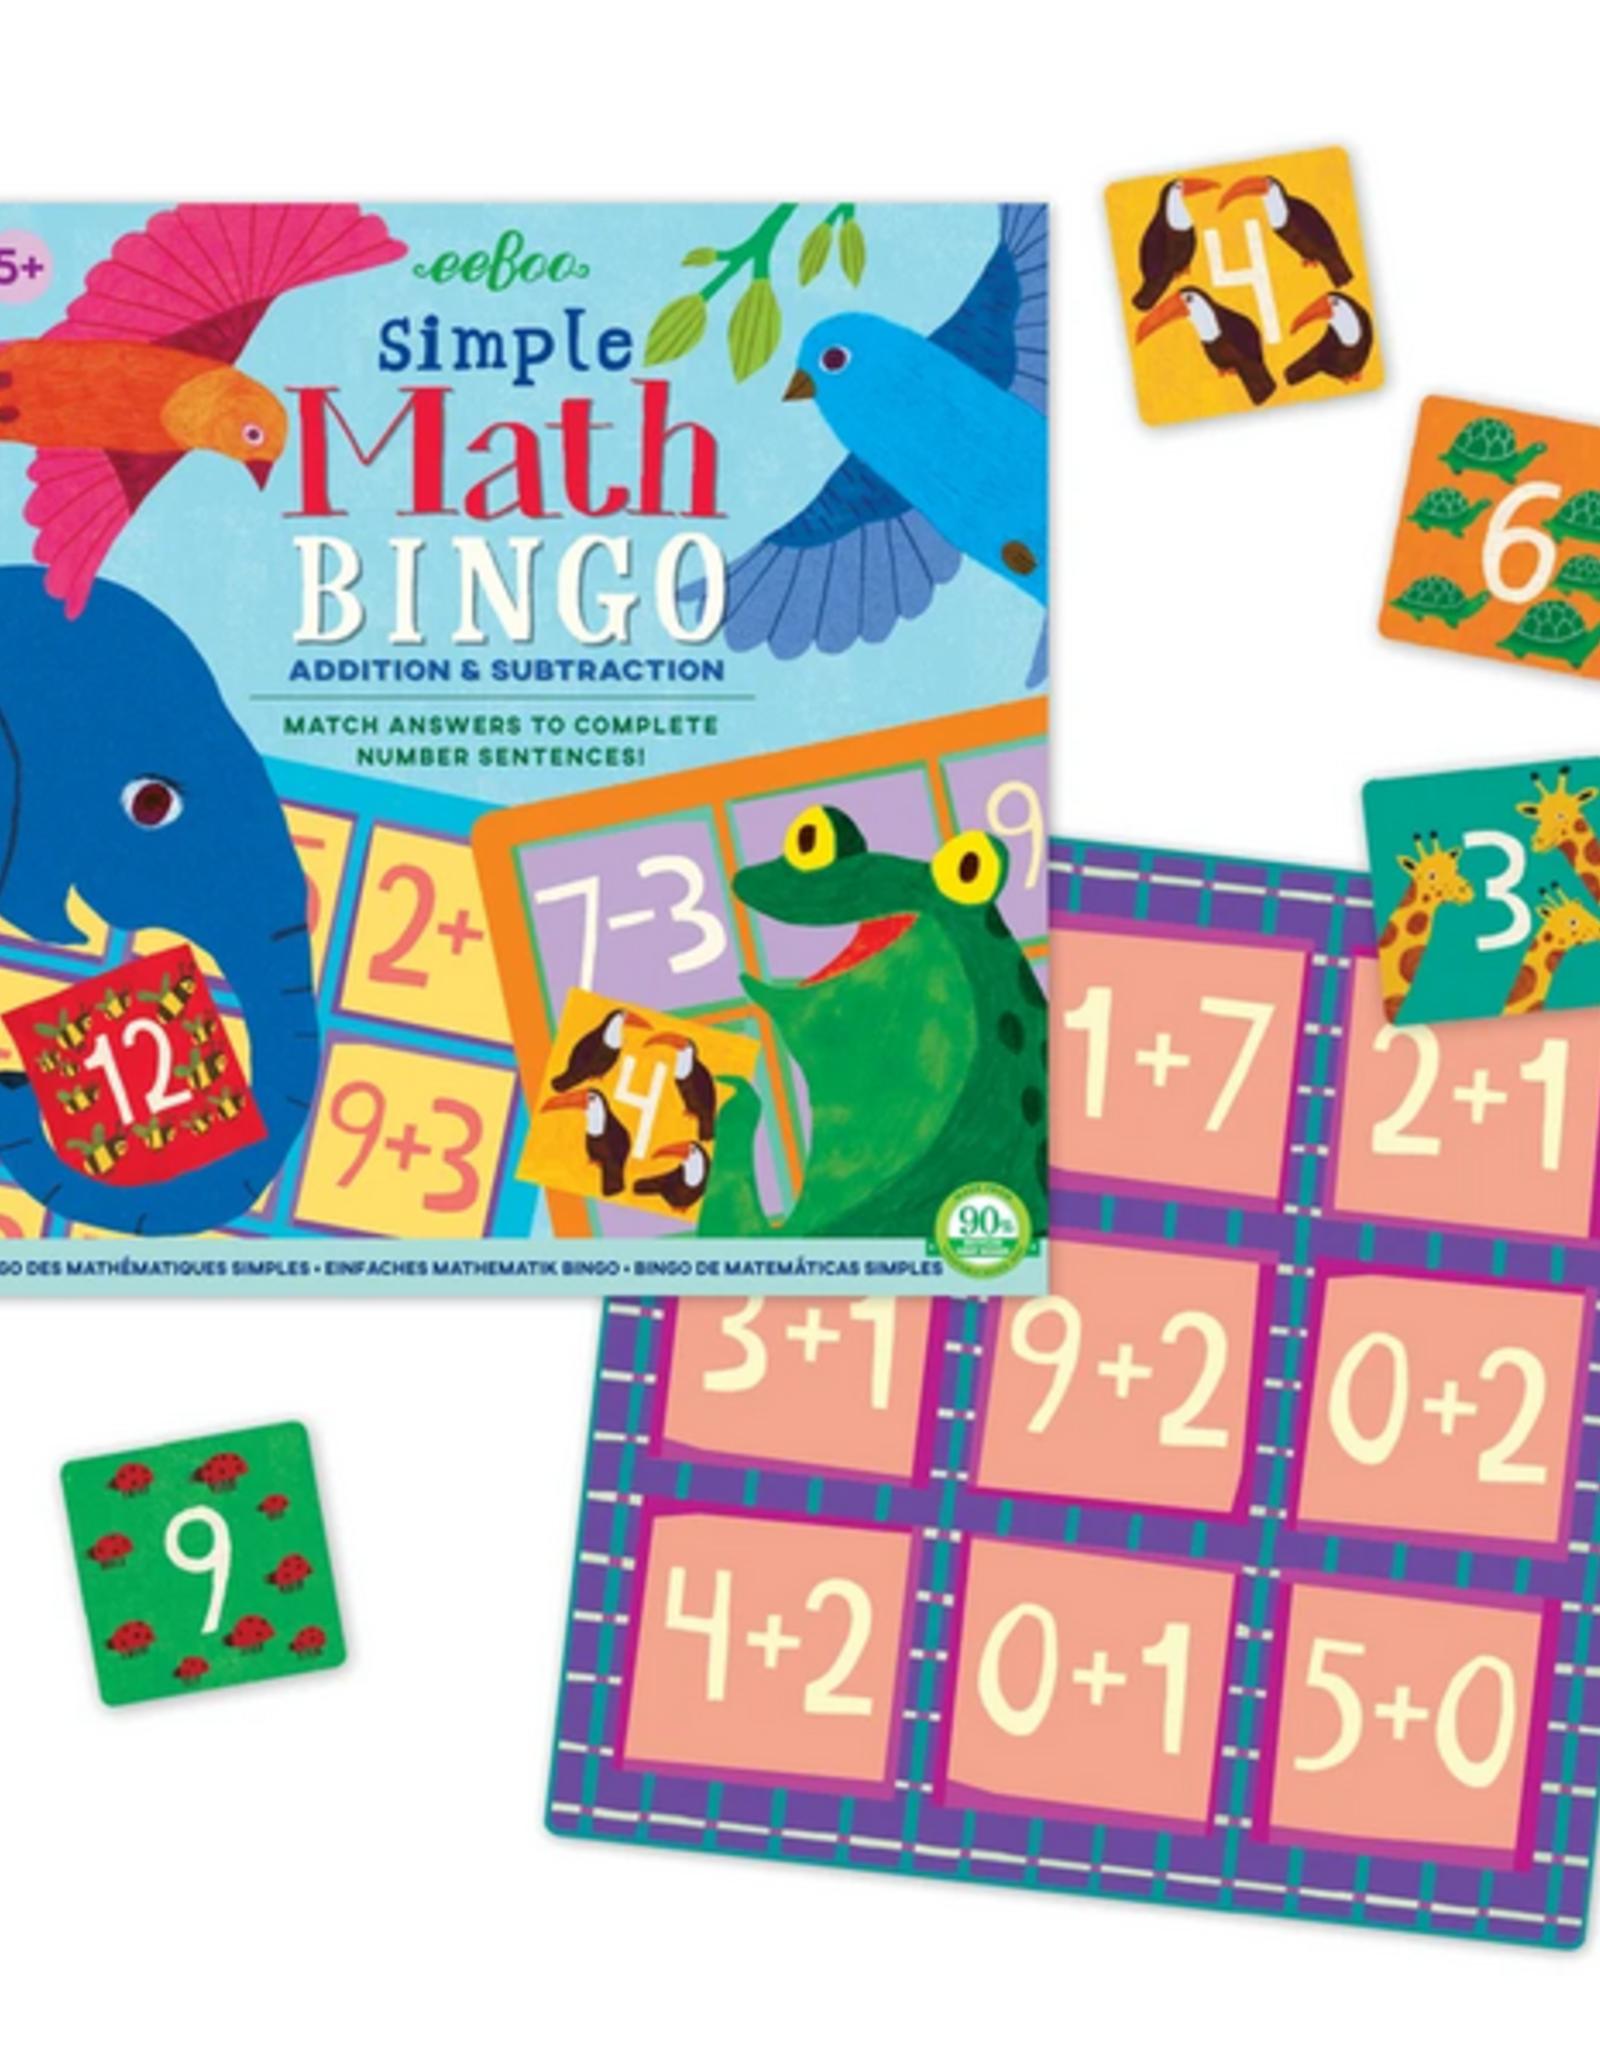 Simple Math Bingo - Addition & Subtraction